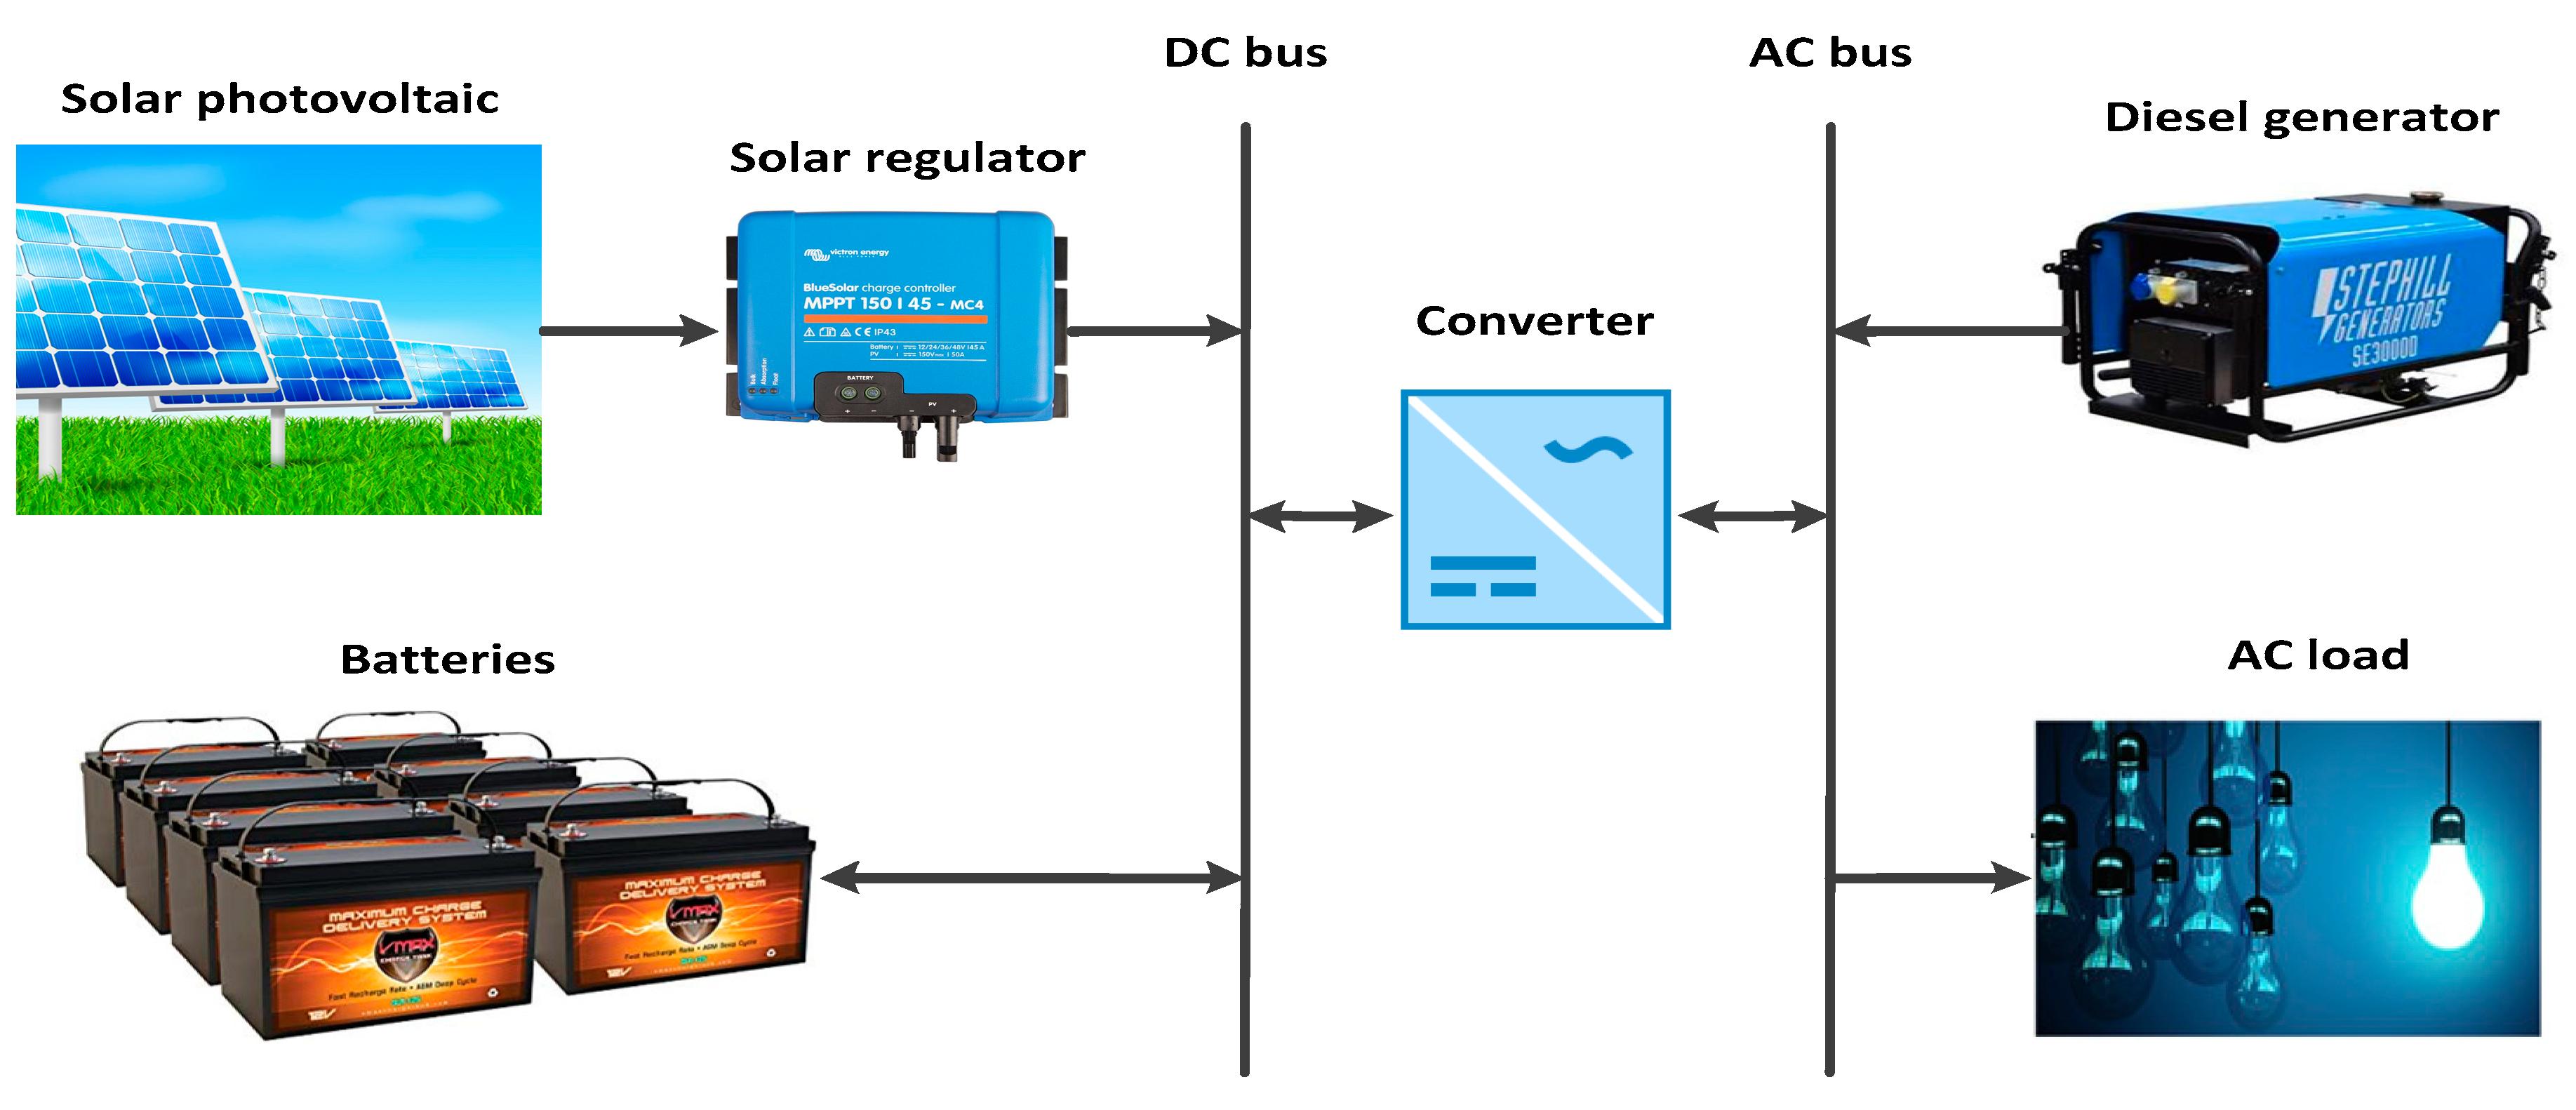 sustainability full text energy management and optimization sustainability 11 00683 g006 figure 6 schematic